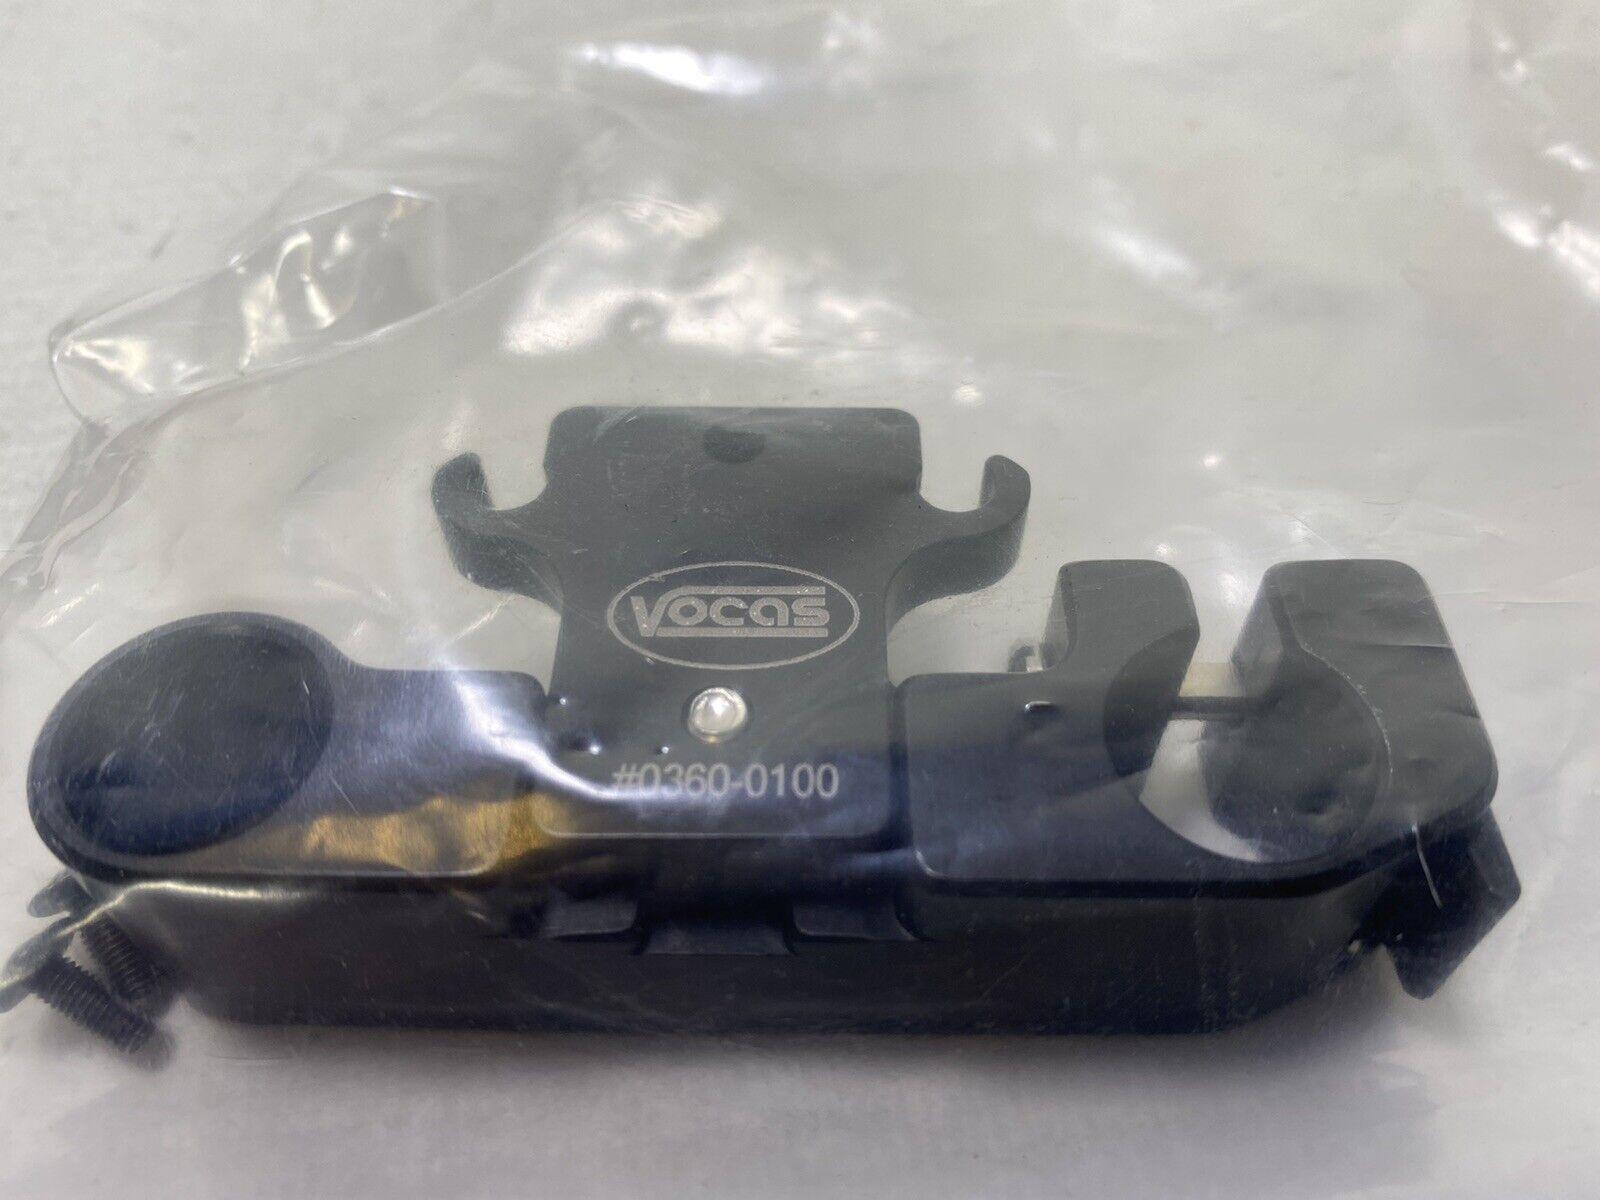 Vocas Height adjustable rails adapter 0360-0100